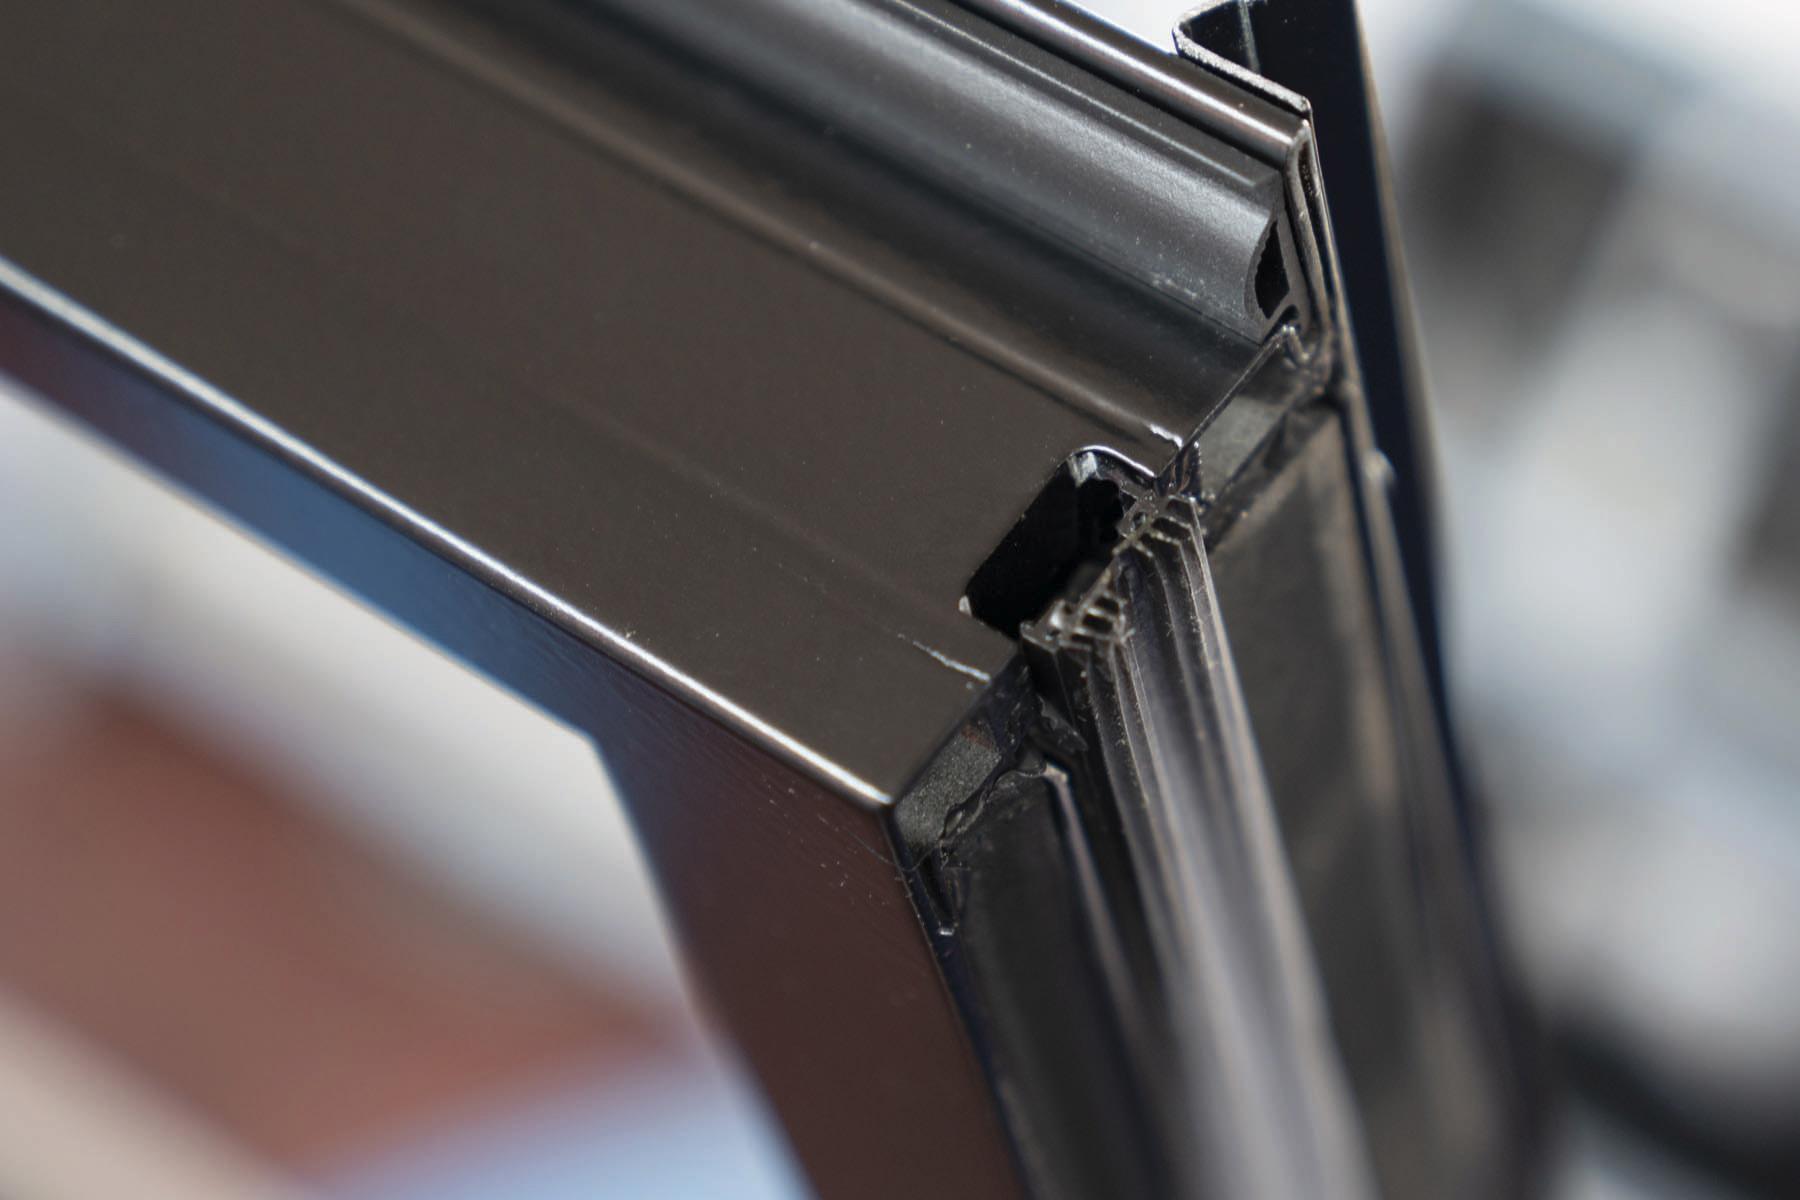 detail of a metal window corner